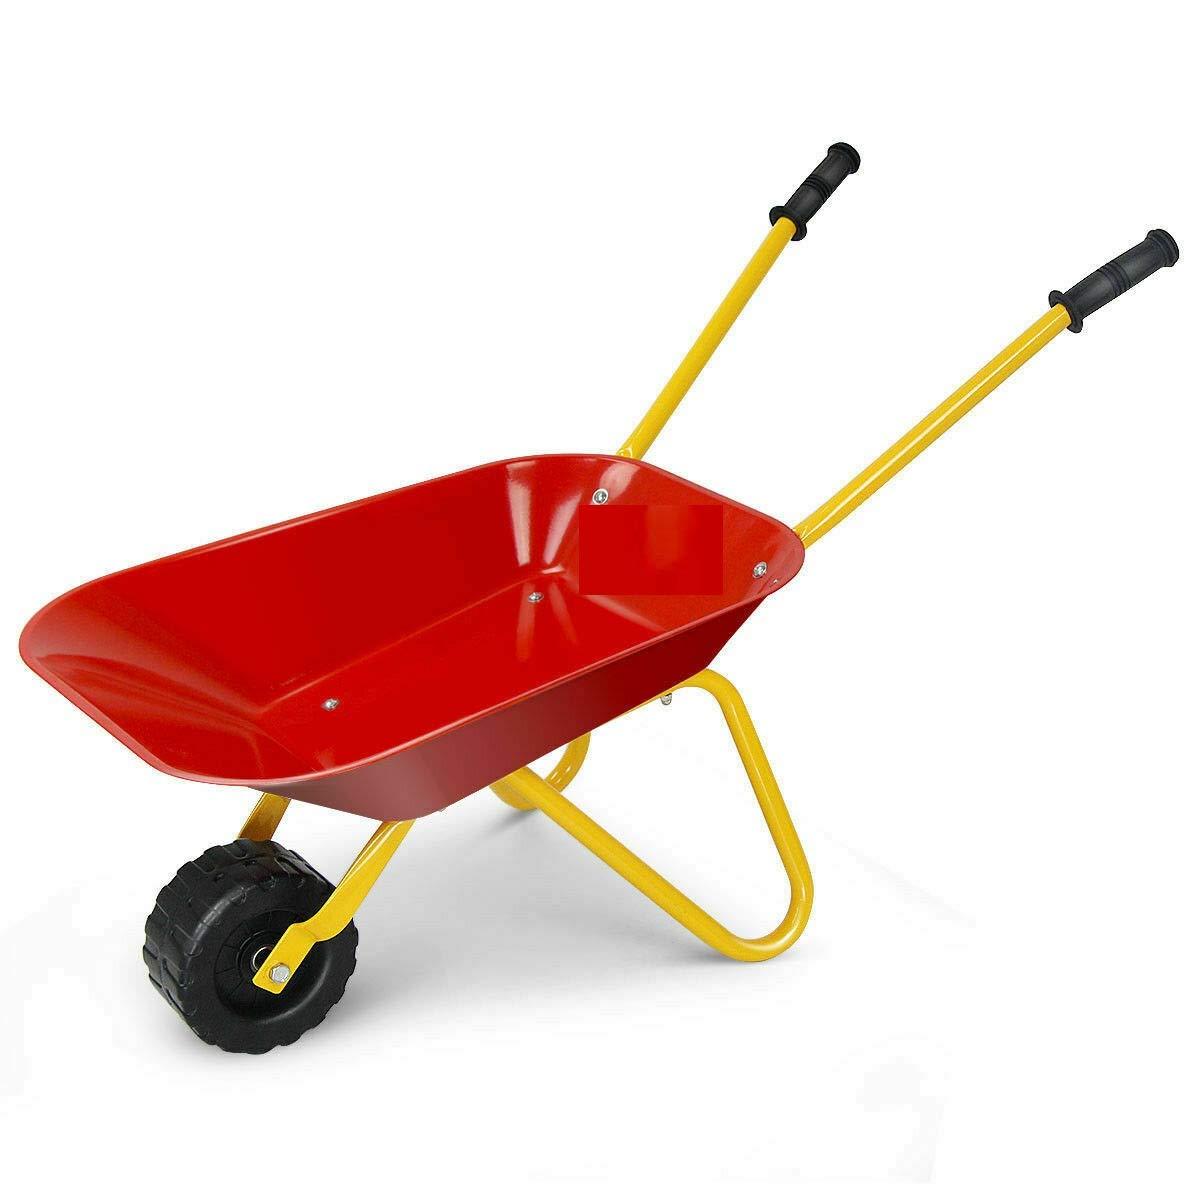 Heize best price Red Kids Metal Wheelbarrow Children's Size Outdoor Garden Backyard Play Toy